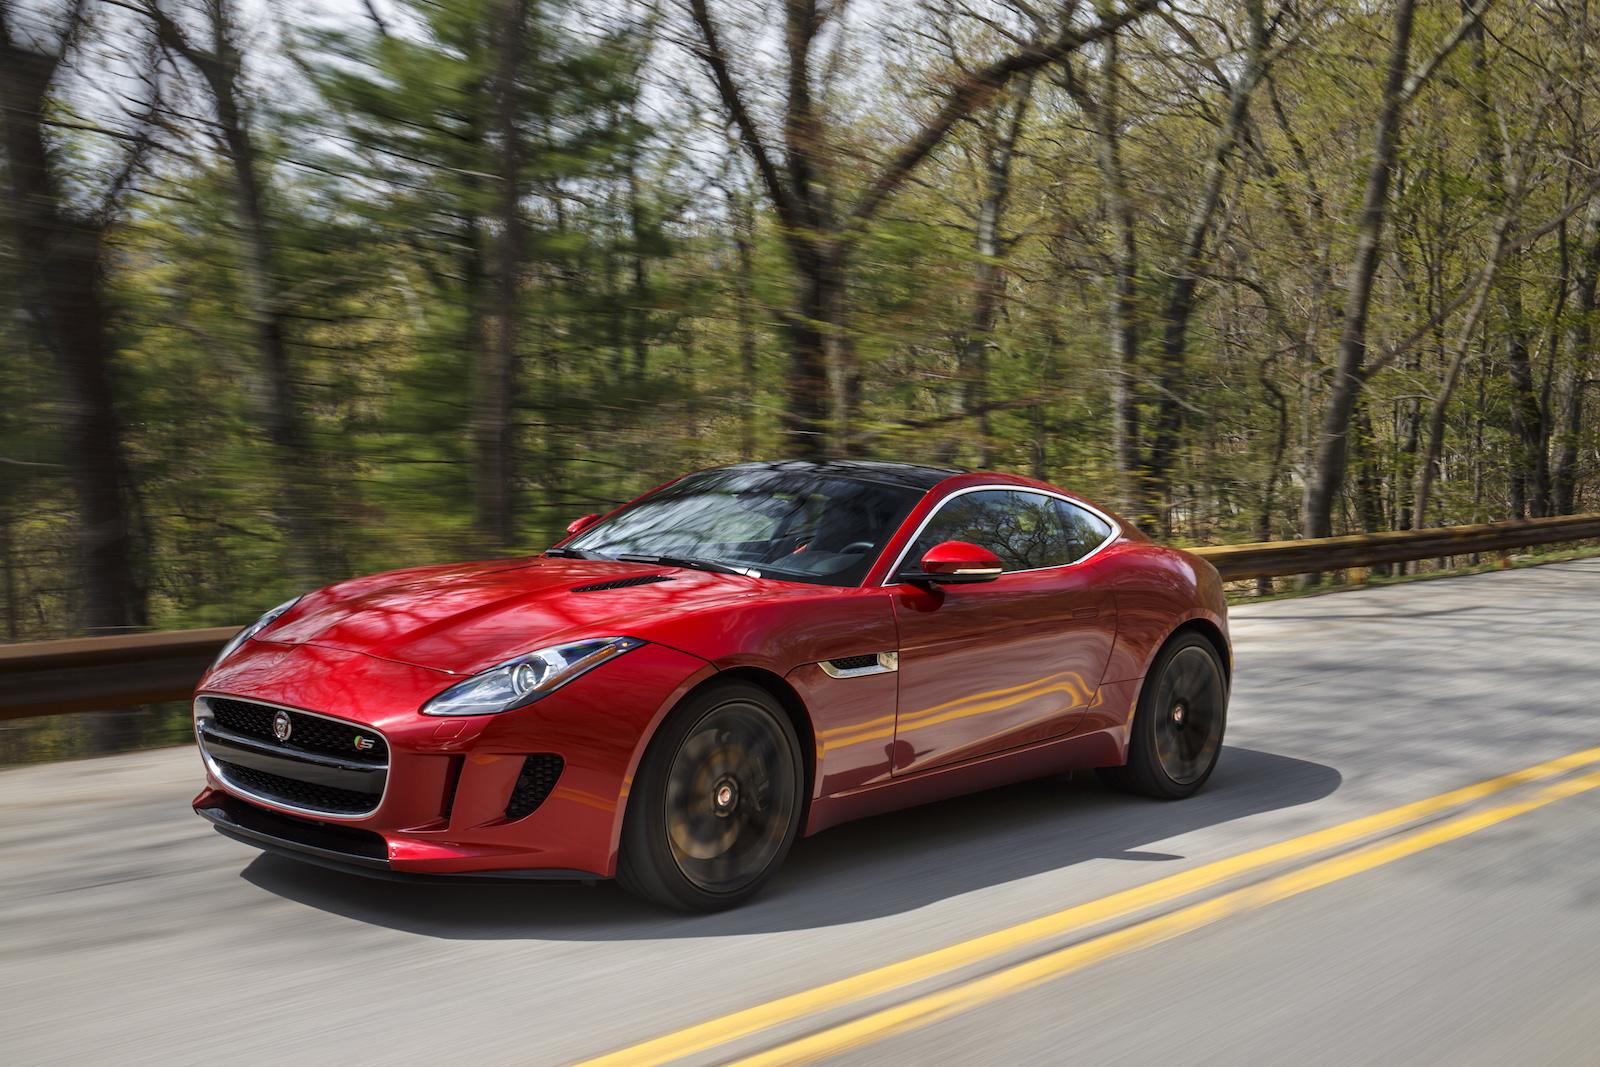 2016 jaguar f type safety review and crash test ratings the car connection. Black Bedroom Furniture Sets. Home Design Ideas